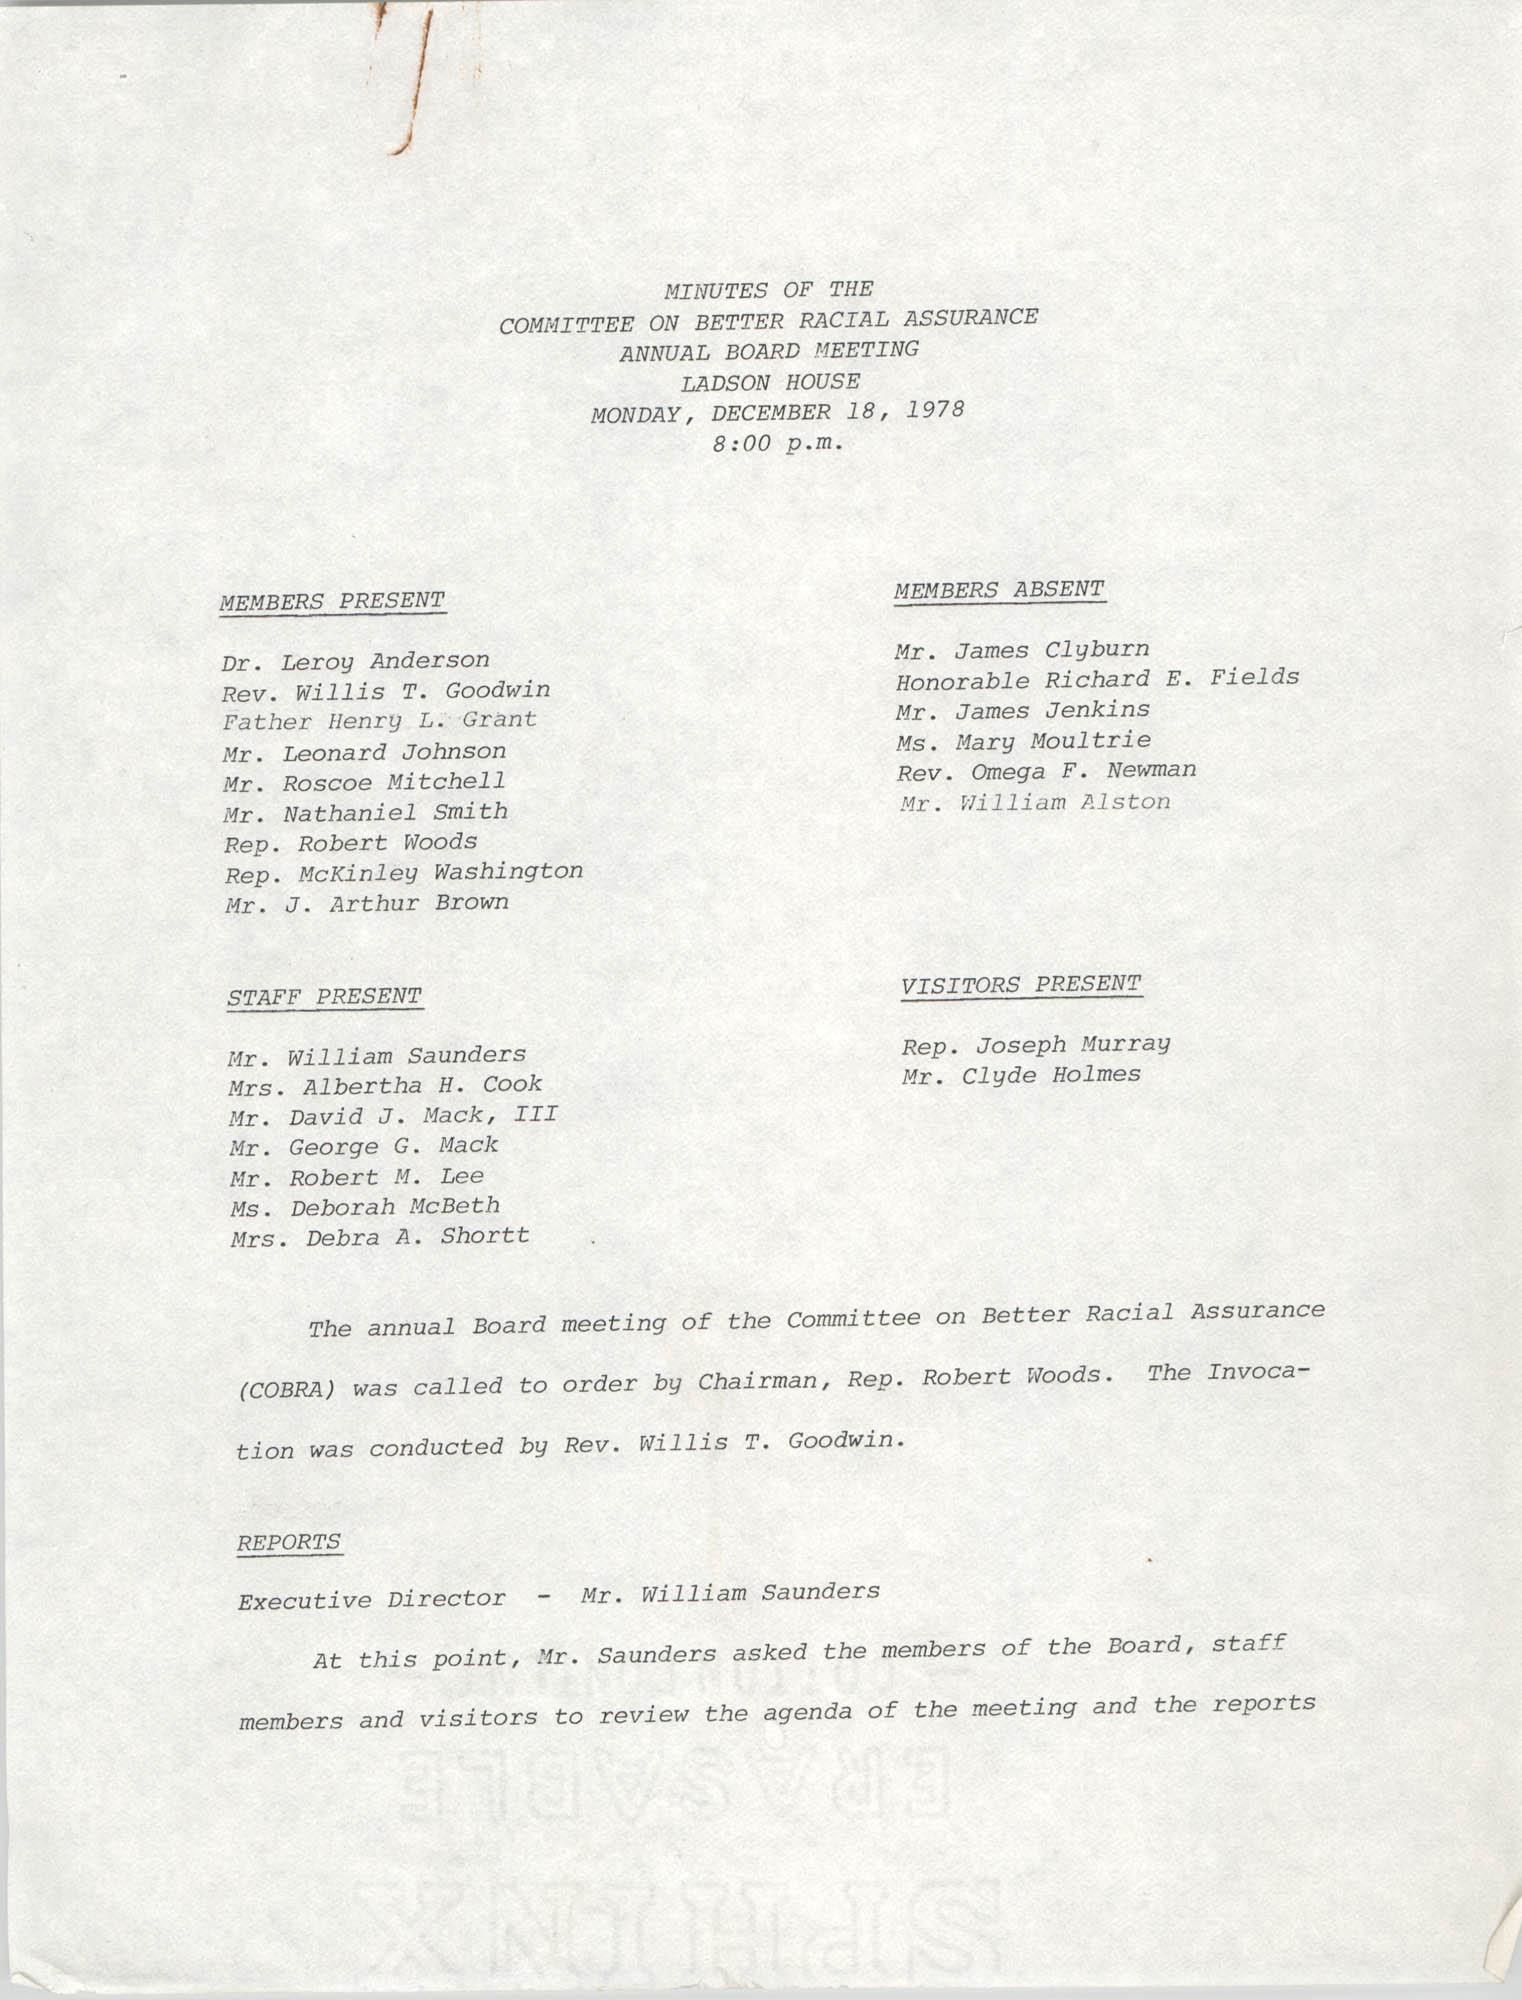 COBRA Annual Board Meeting Minutes, December 18, 1978